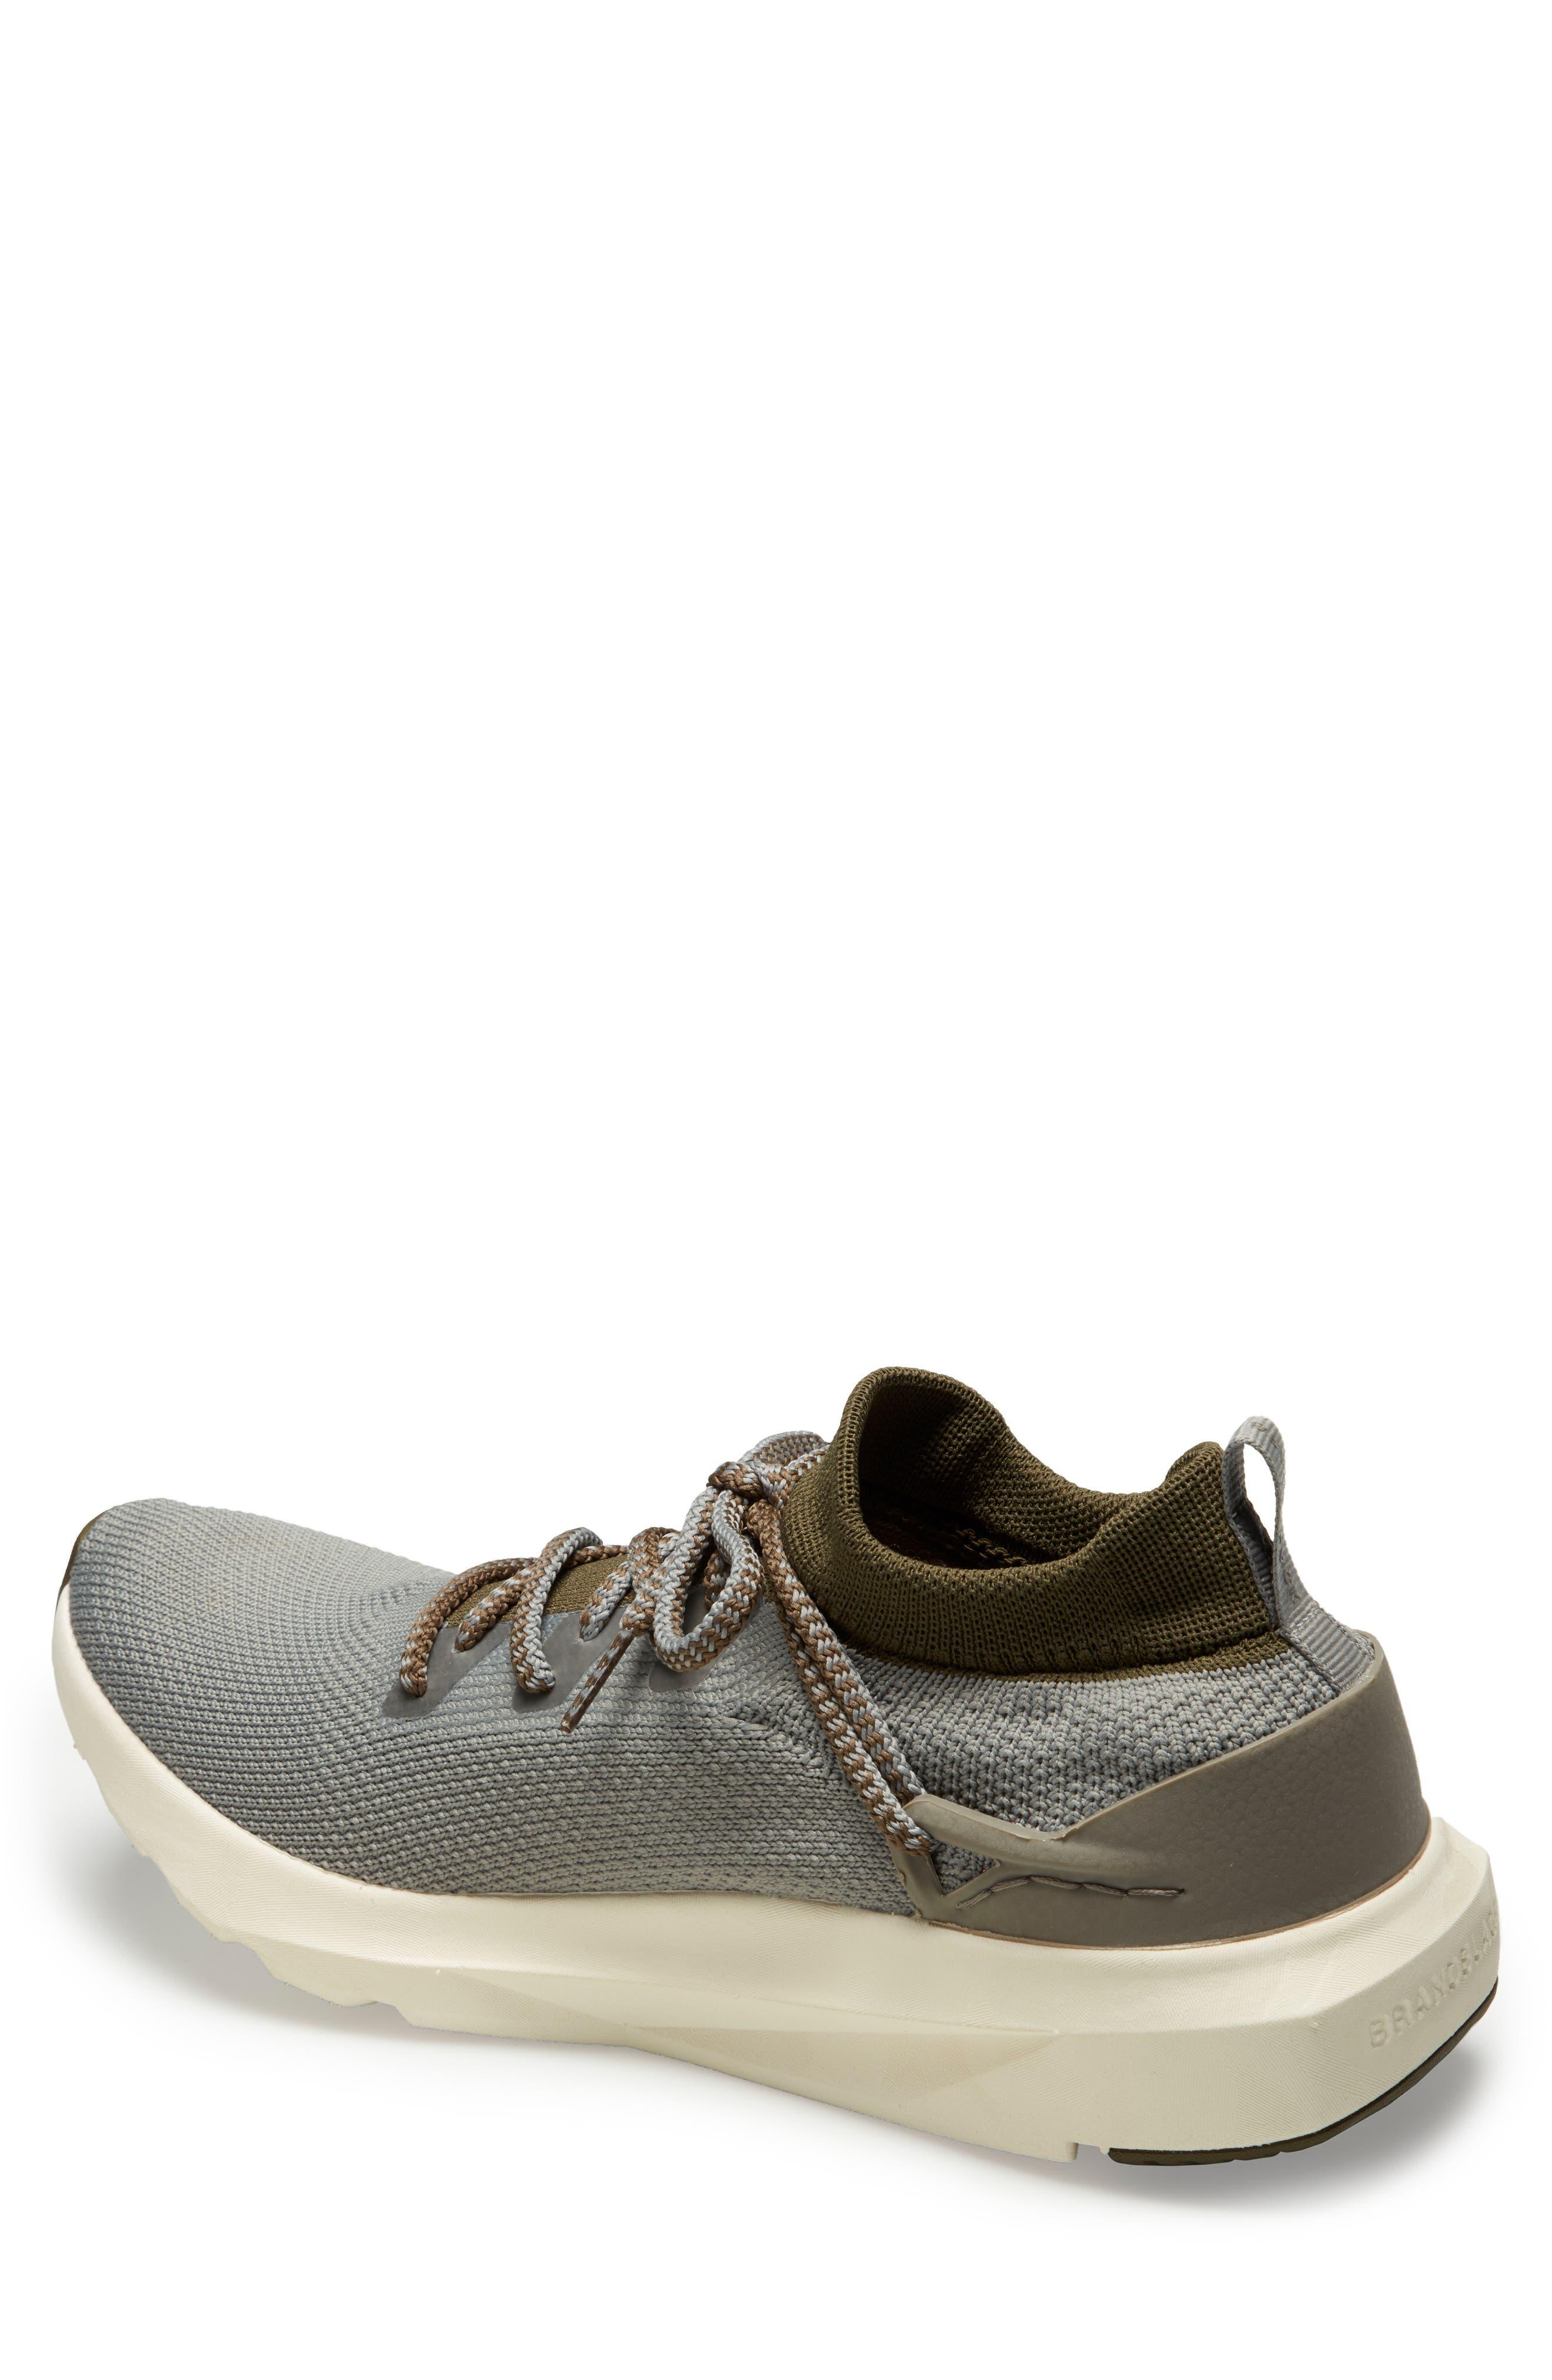 Kaze Sneaker,                             Alternate thumbnail 5, color,